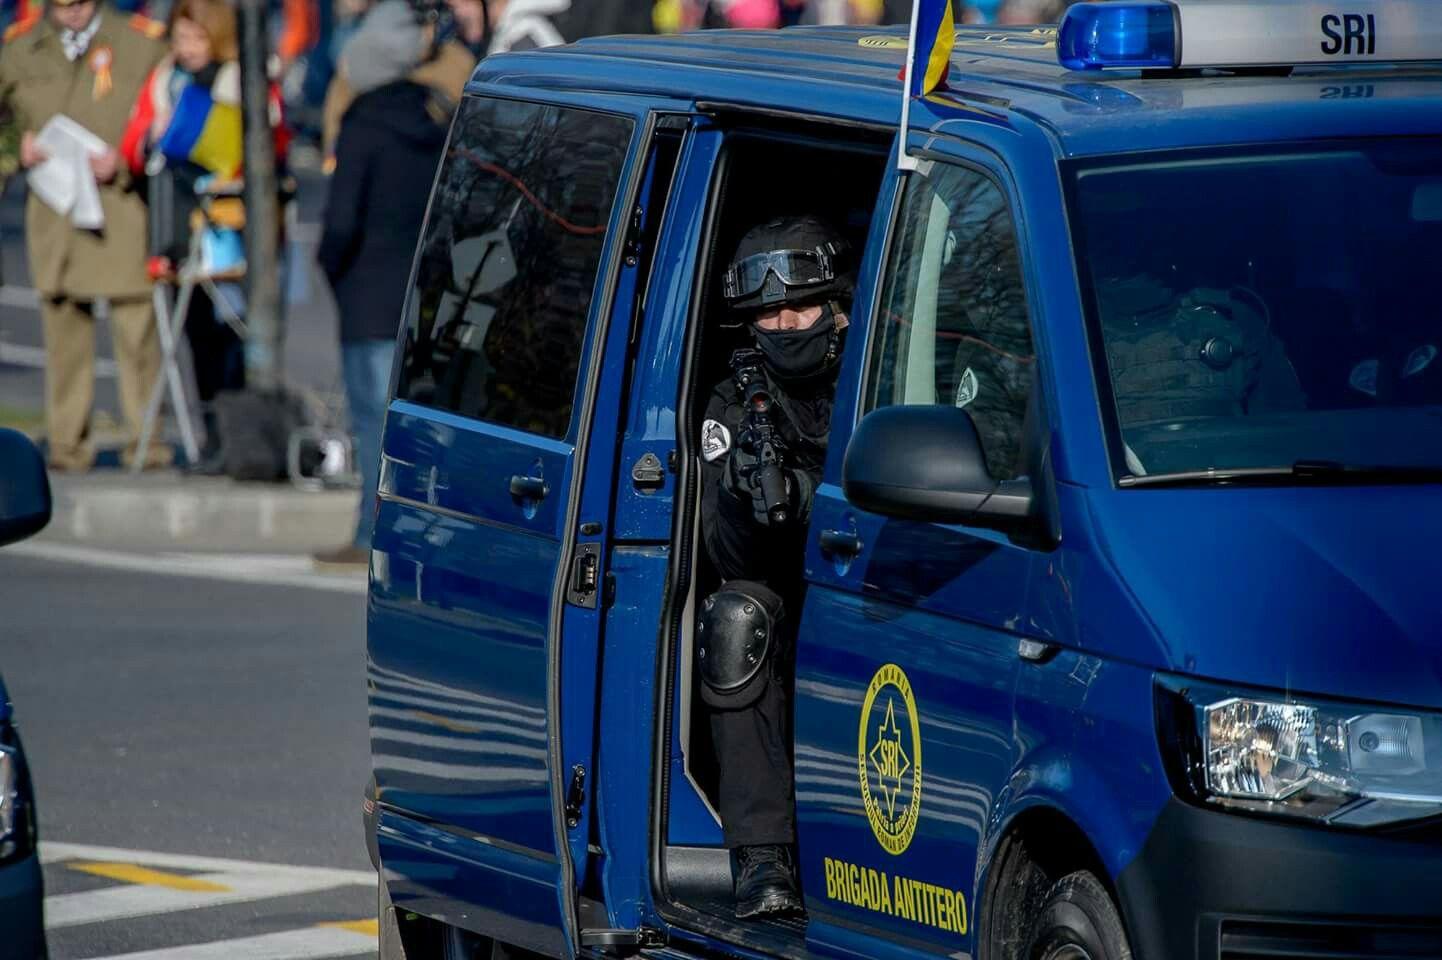 S.R.I. _B.A.T. Serviciul Roman de Informatii_ Brigada Antiterorista Romanian Intelligence Service_ Anti-terrorist Brigade 1st December 2016 Unification parade